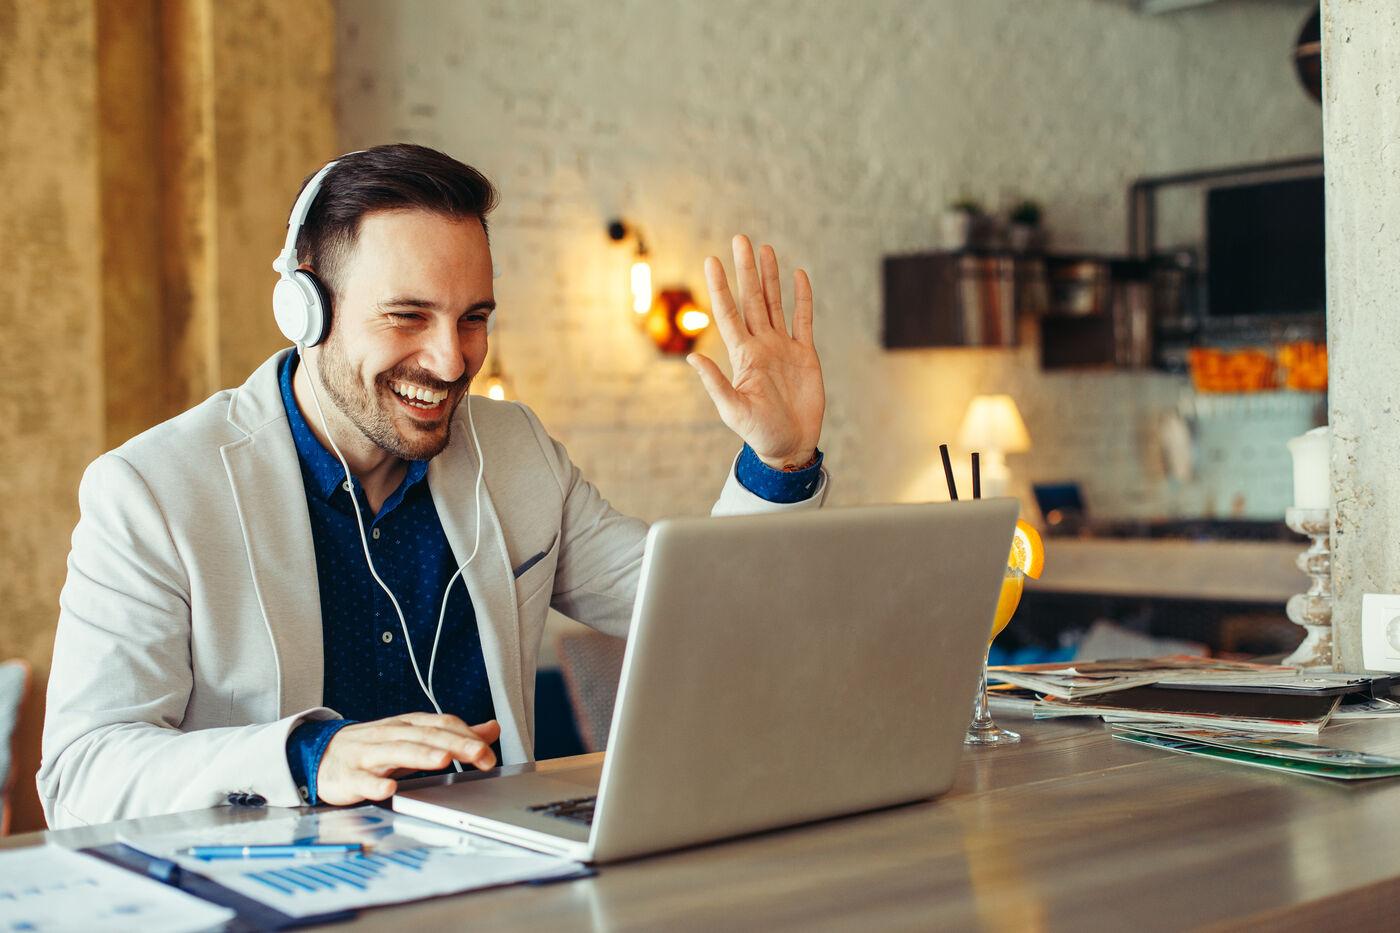 Consultant für Microsoft Teams Calling & Meeting (m/w/d) - Job Homeoffice - Bewerbungsformular